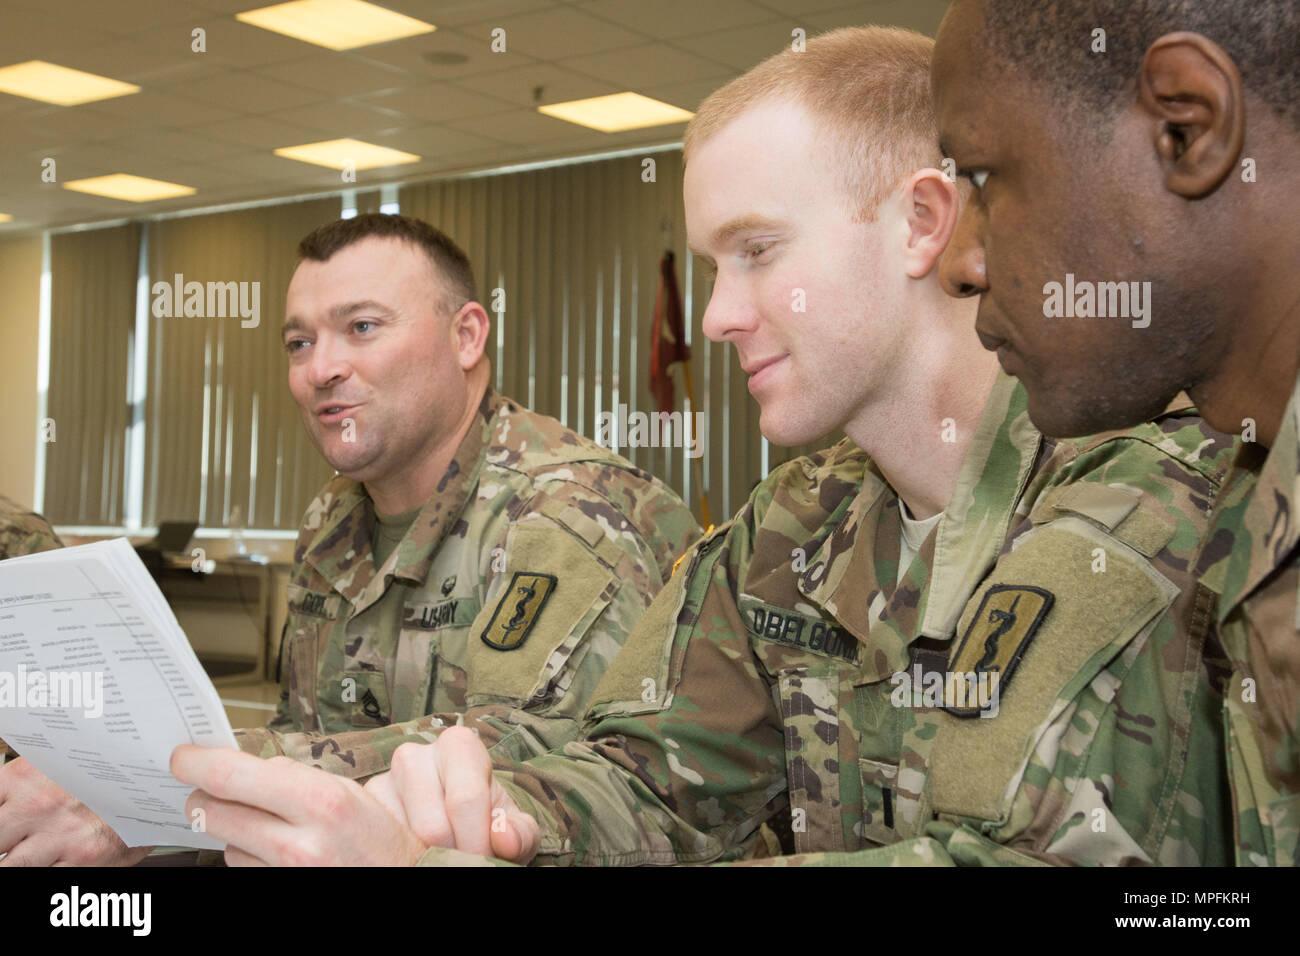 Army Behavioral Health Stock Photos & Army Behavioral Health Stock